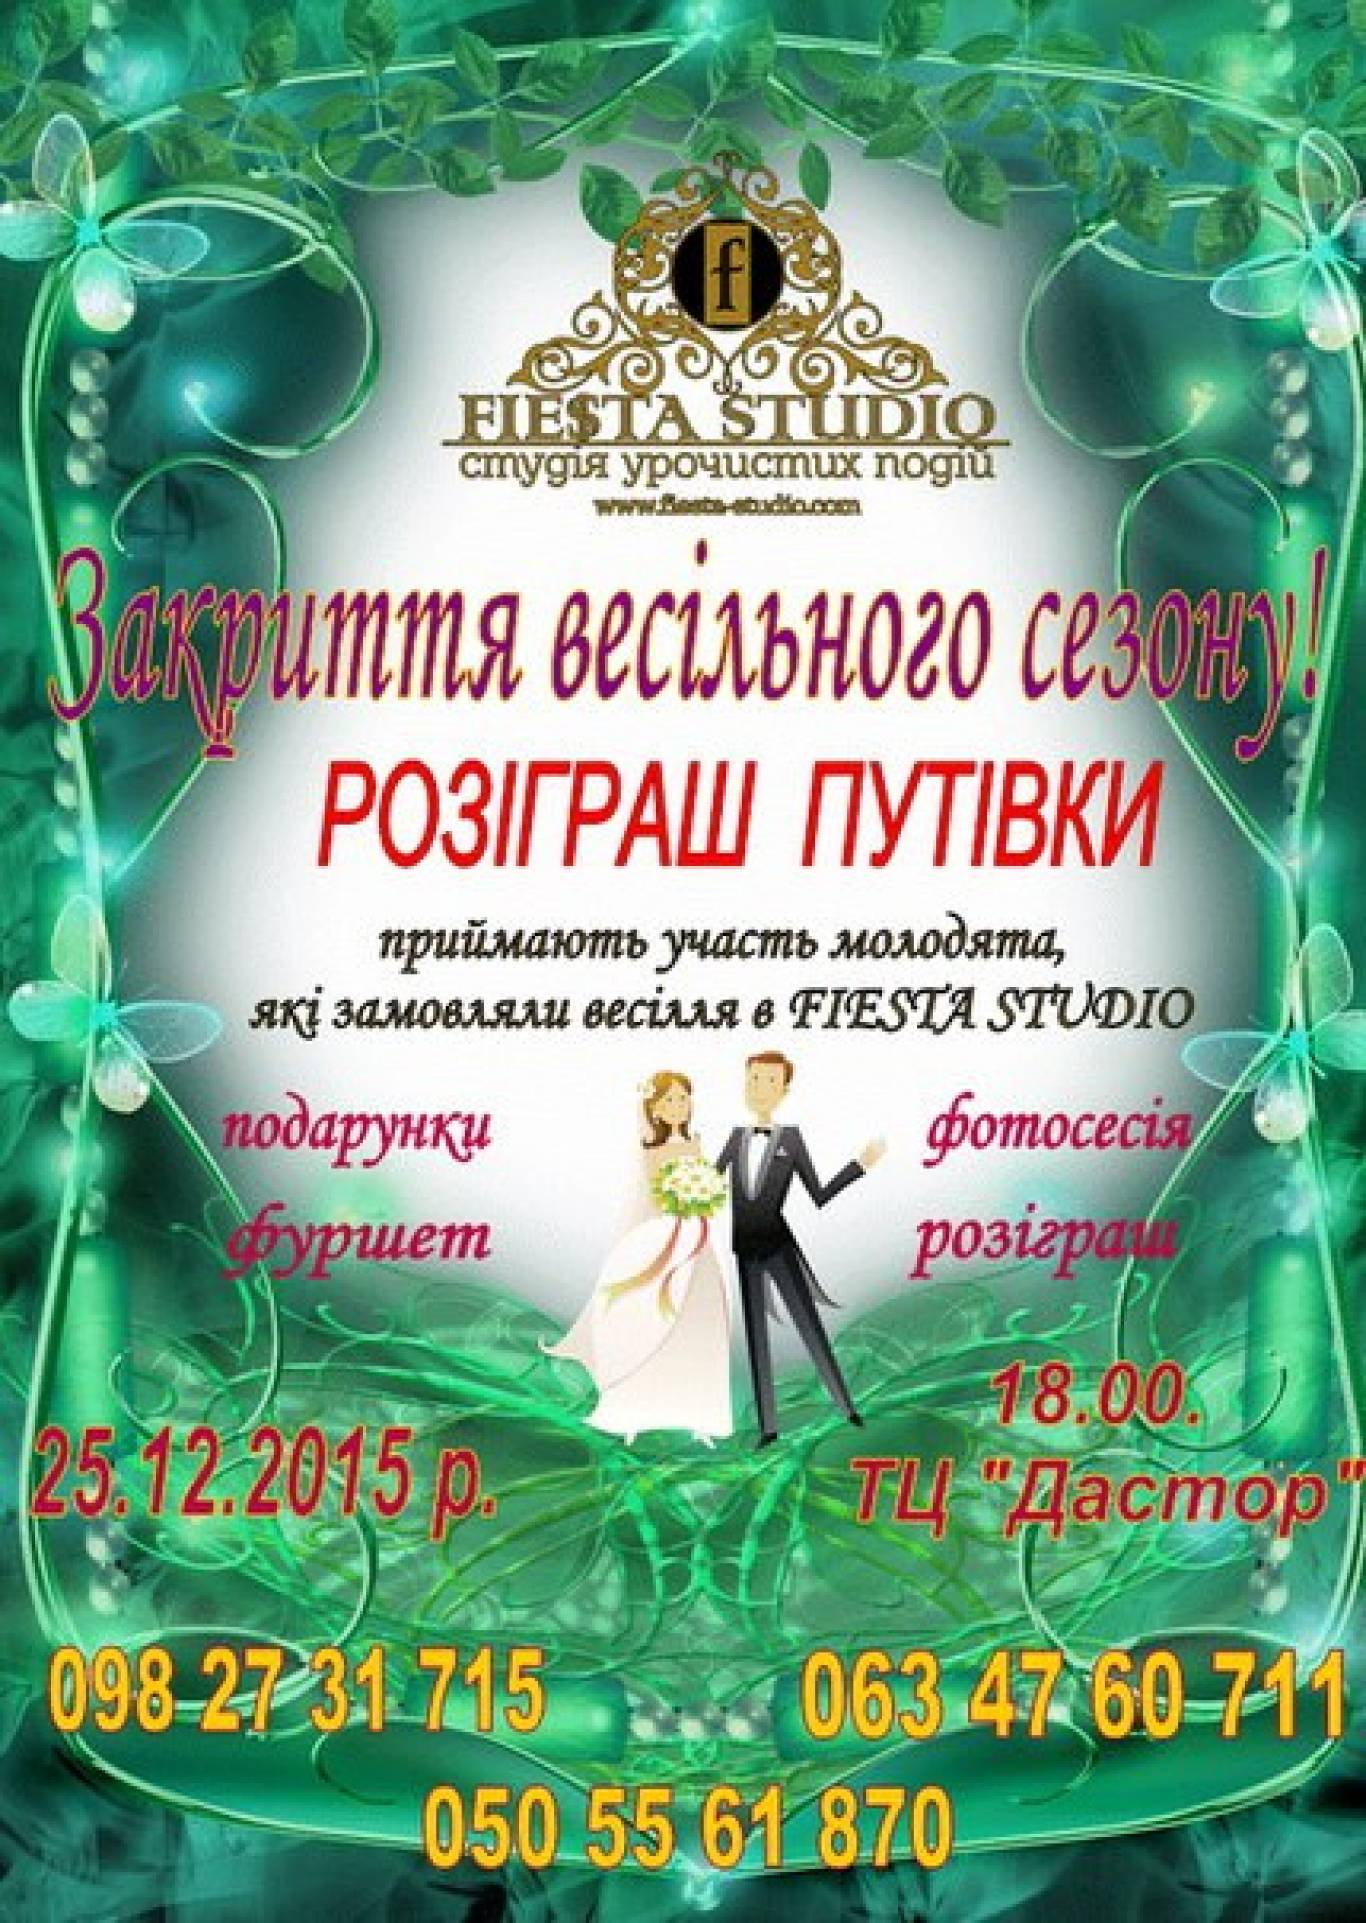 Закриття весільного сезону